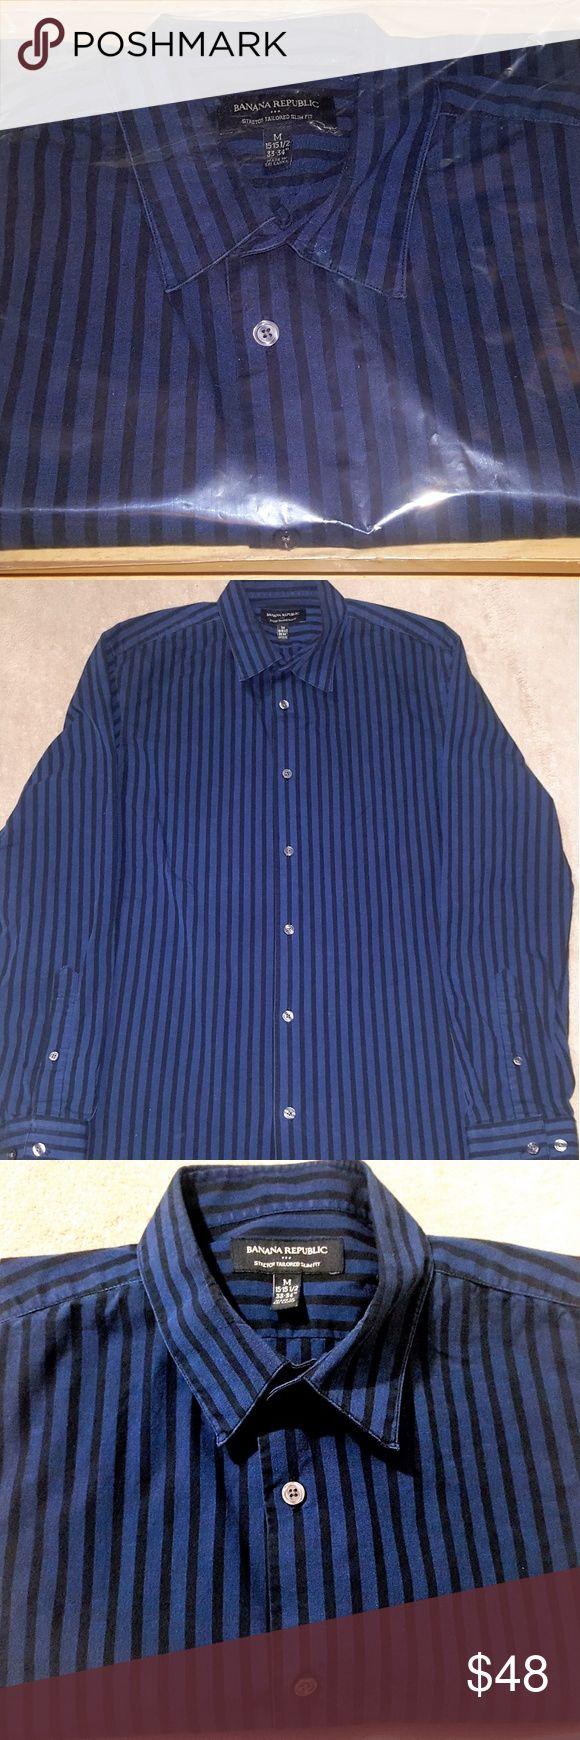 "Banana Republic Button Front Men's Shirt (M) NEW BRAND NEW - Plastic Sealed  Brand - Banana Republic Department - Men's Size - Medium Style - Button Down Dress Shirt Sleeve Length - Long Sleeve Color - Dark Blue Design - Vertical Stripes ( Black ) Measurements - M ( 15-15.5 / 33""-34"" ) MSRP - $79.50  100% Satisfaction / Money Back Gaurenteed Banana Republic Shirts Dress Shirts"